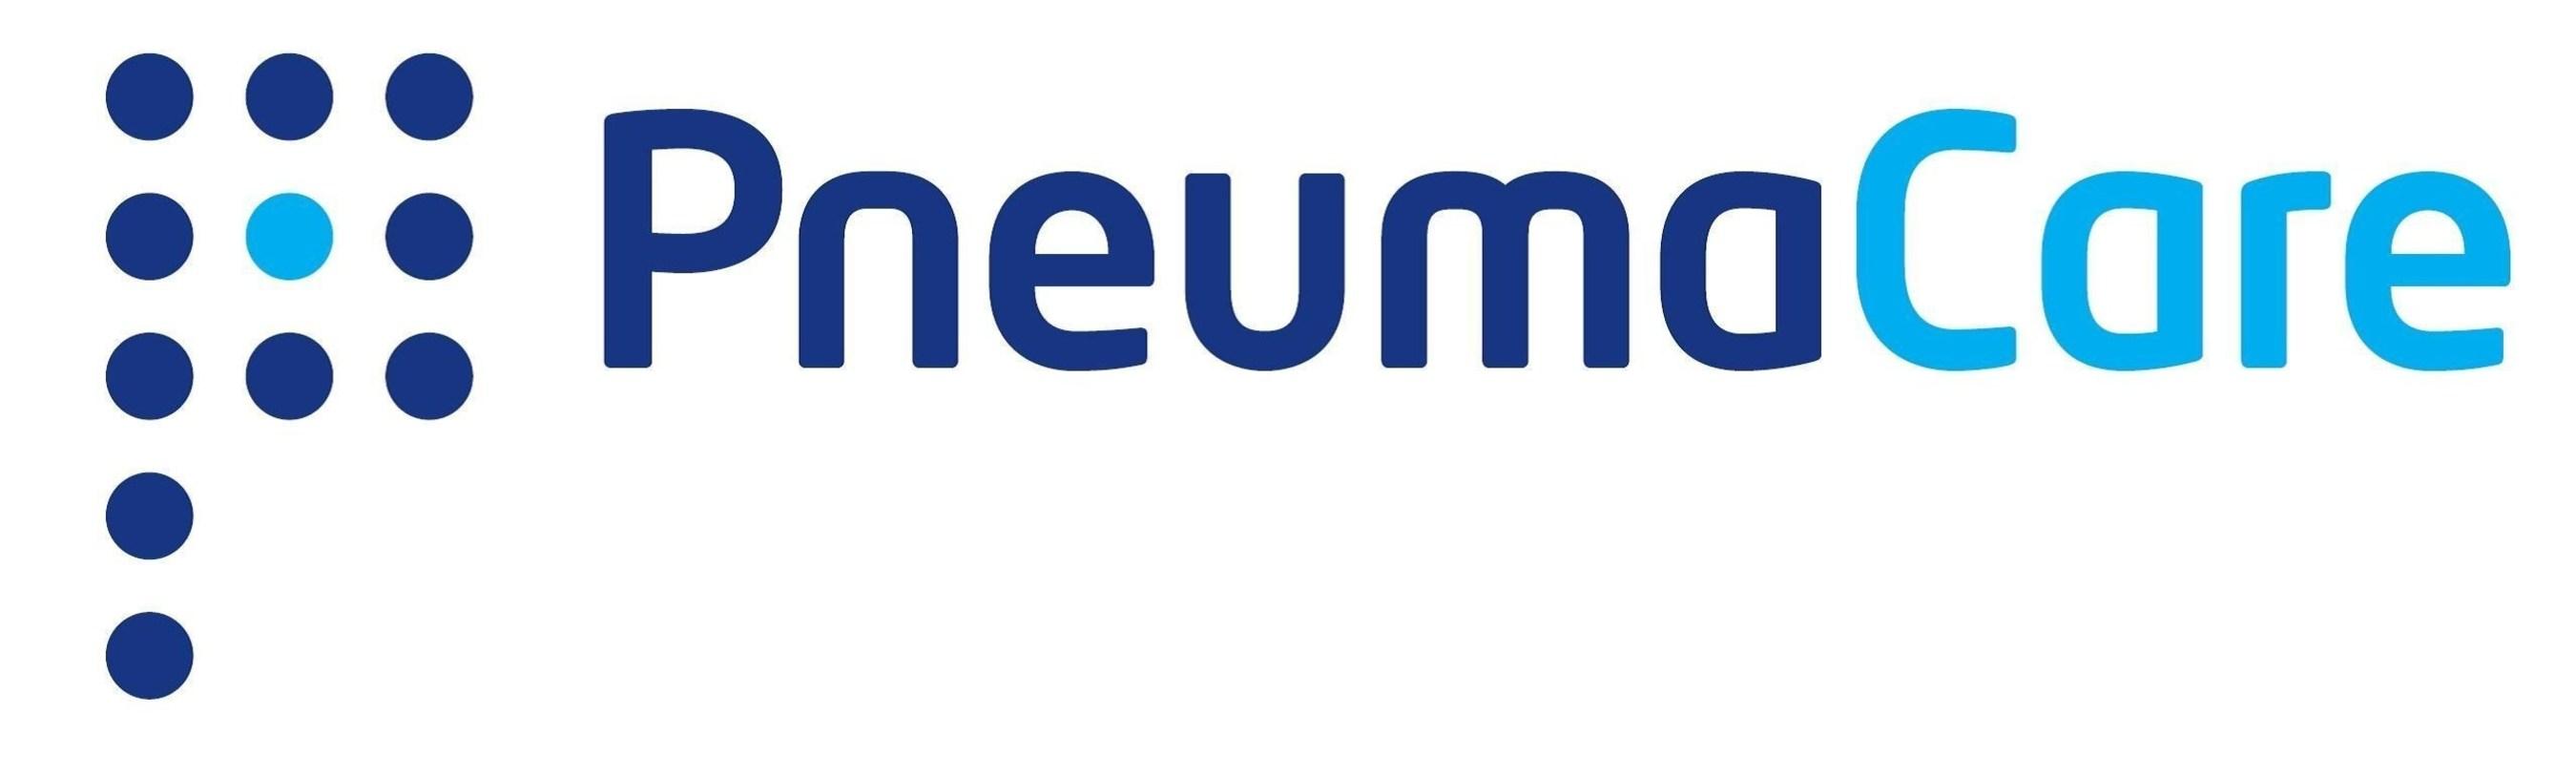 PneumaCare Logo (PRNewsFoto/PneumaCare Ltd) (PRNewsFoto/PneumaCare Ltd)